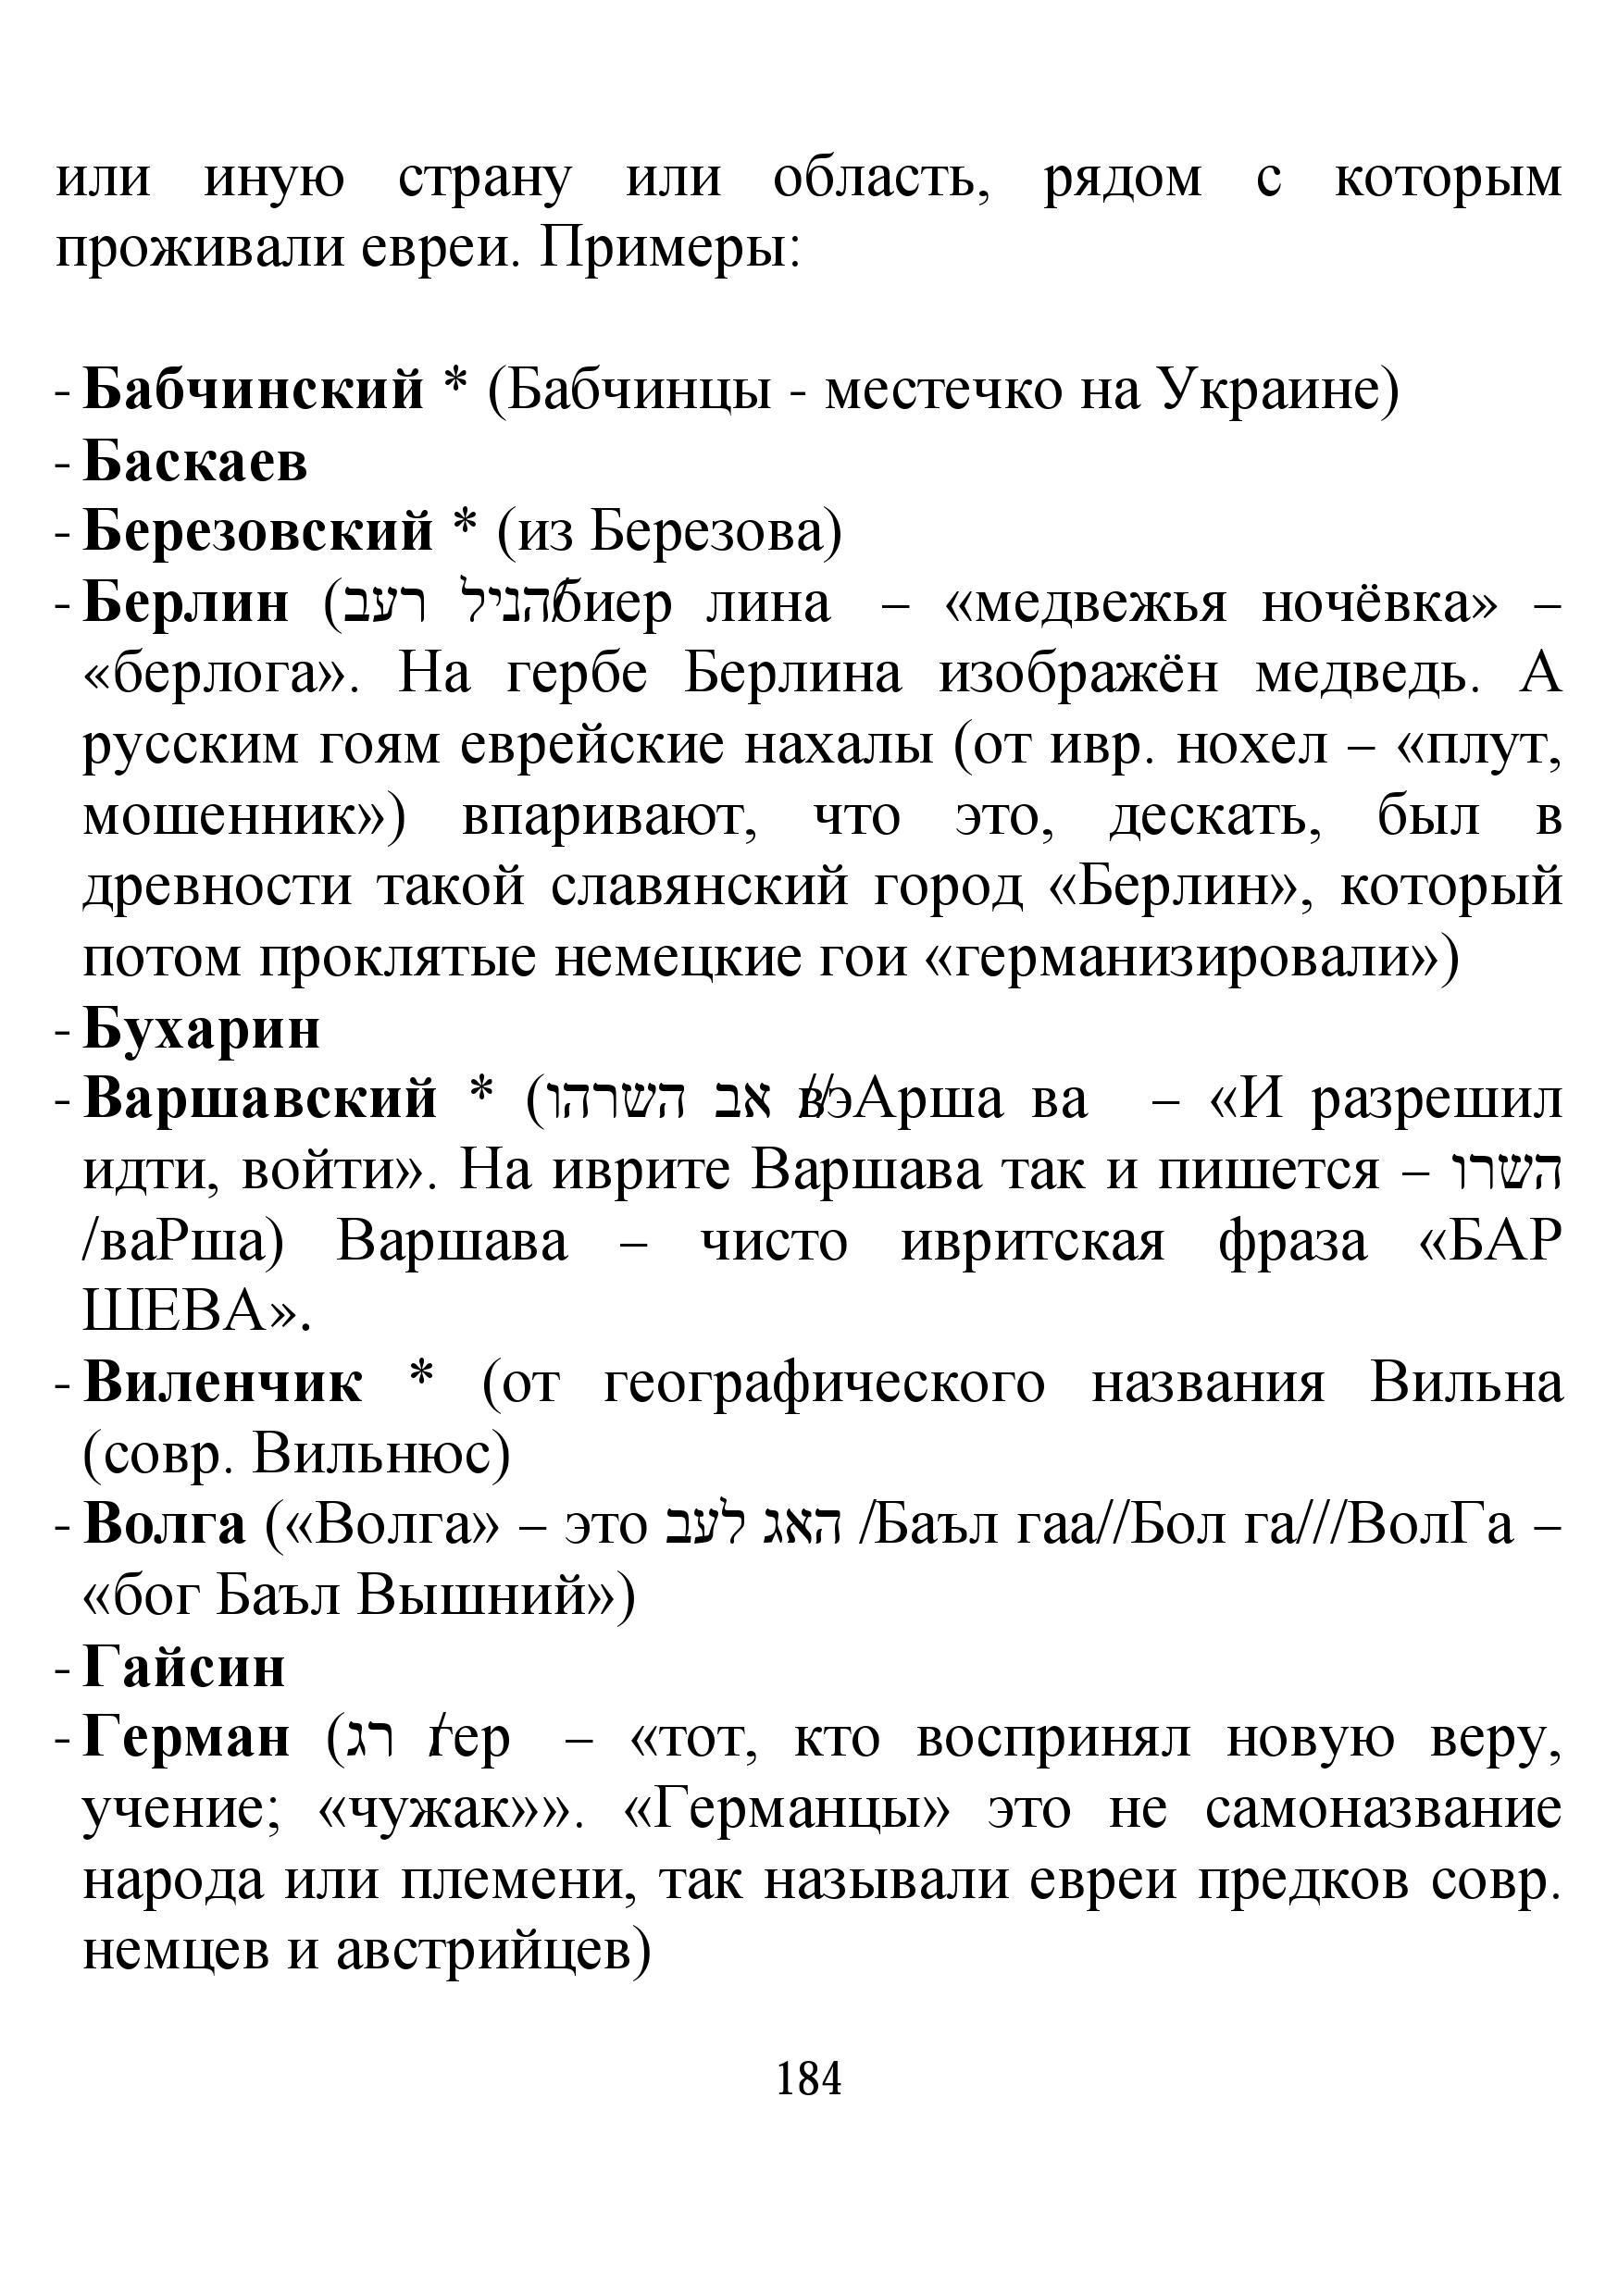 http://sf.uploads.ru/Lnrk9.jpg